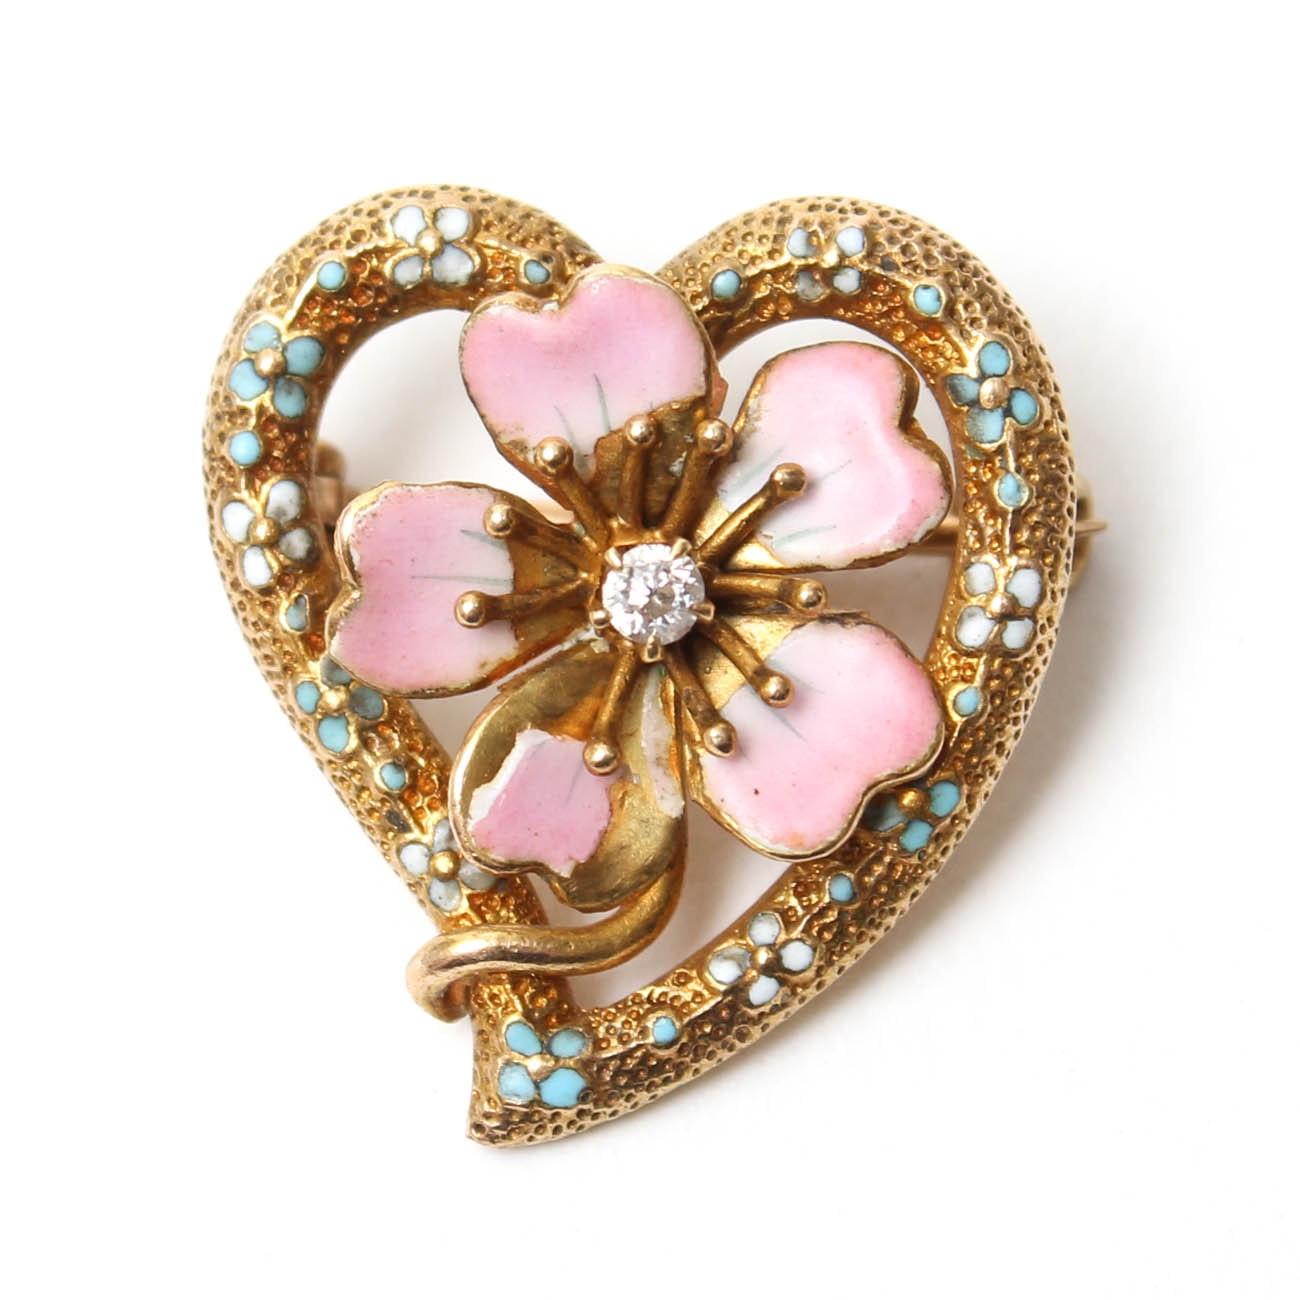 Krementz Art Nouveau 14K Yellow Gold Diamond Brooch